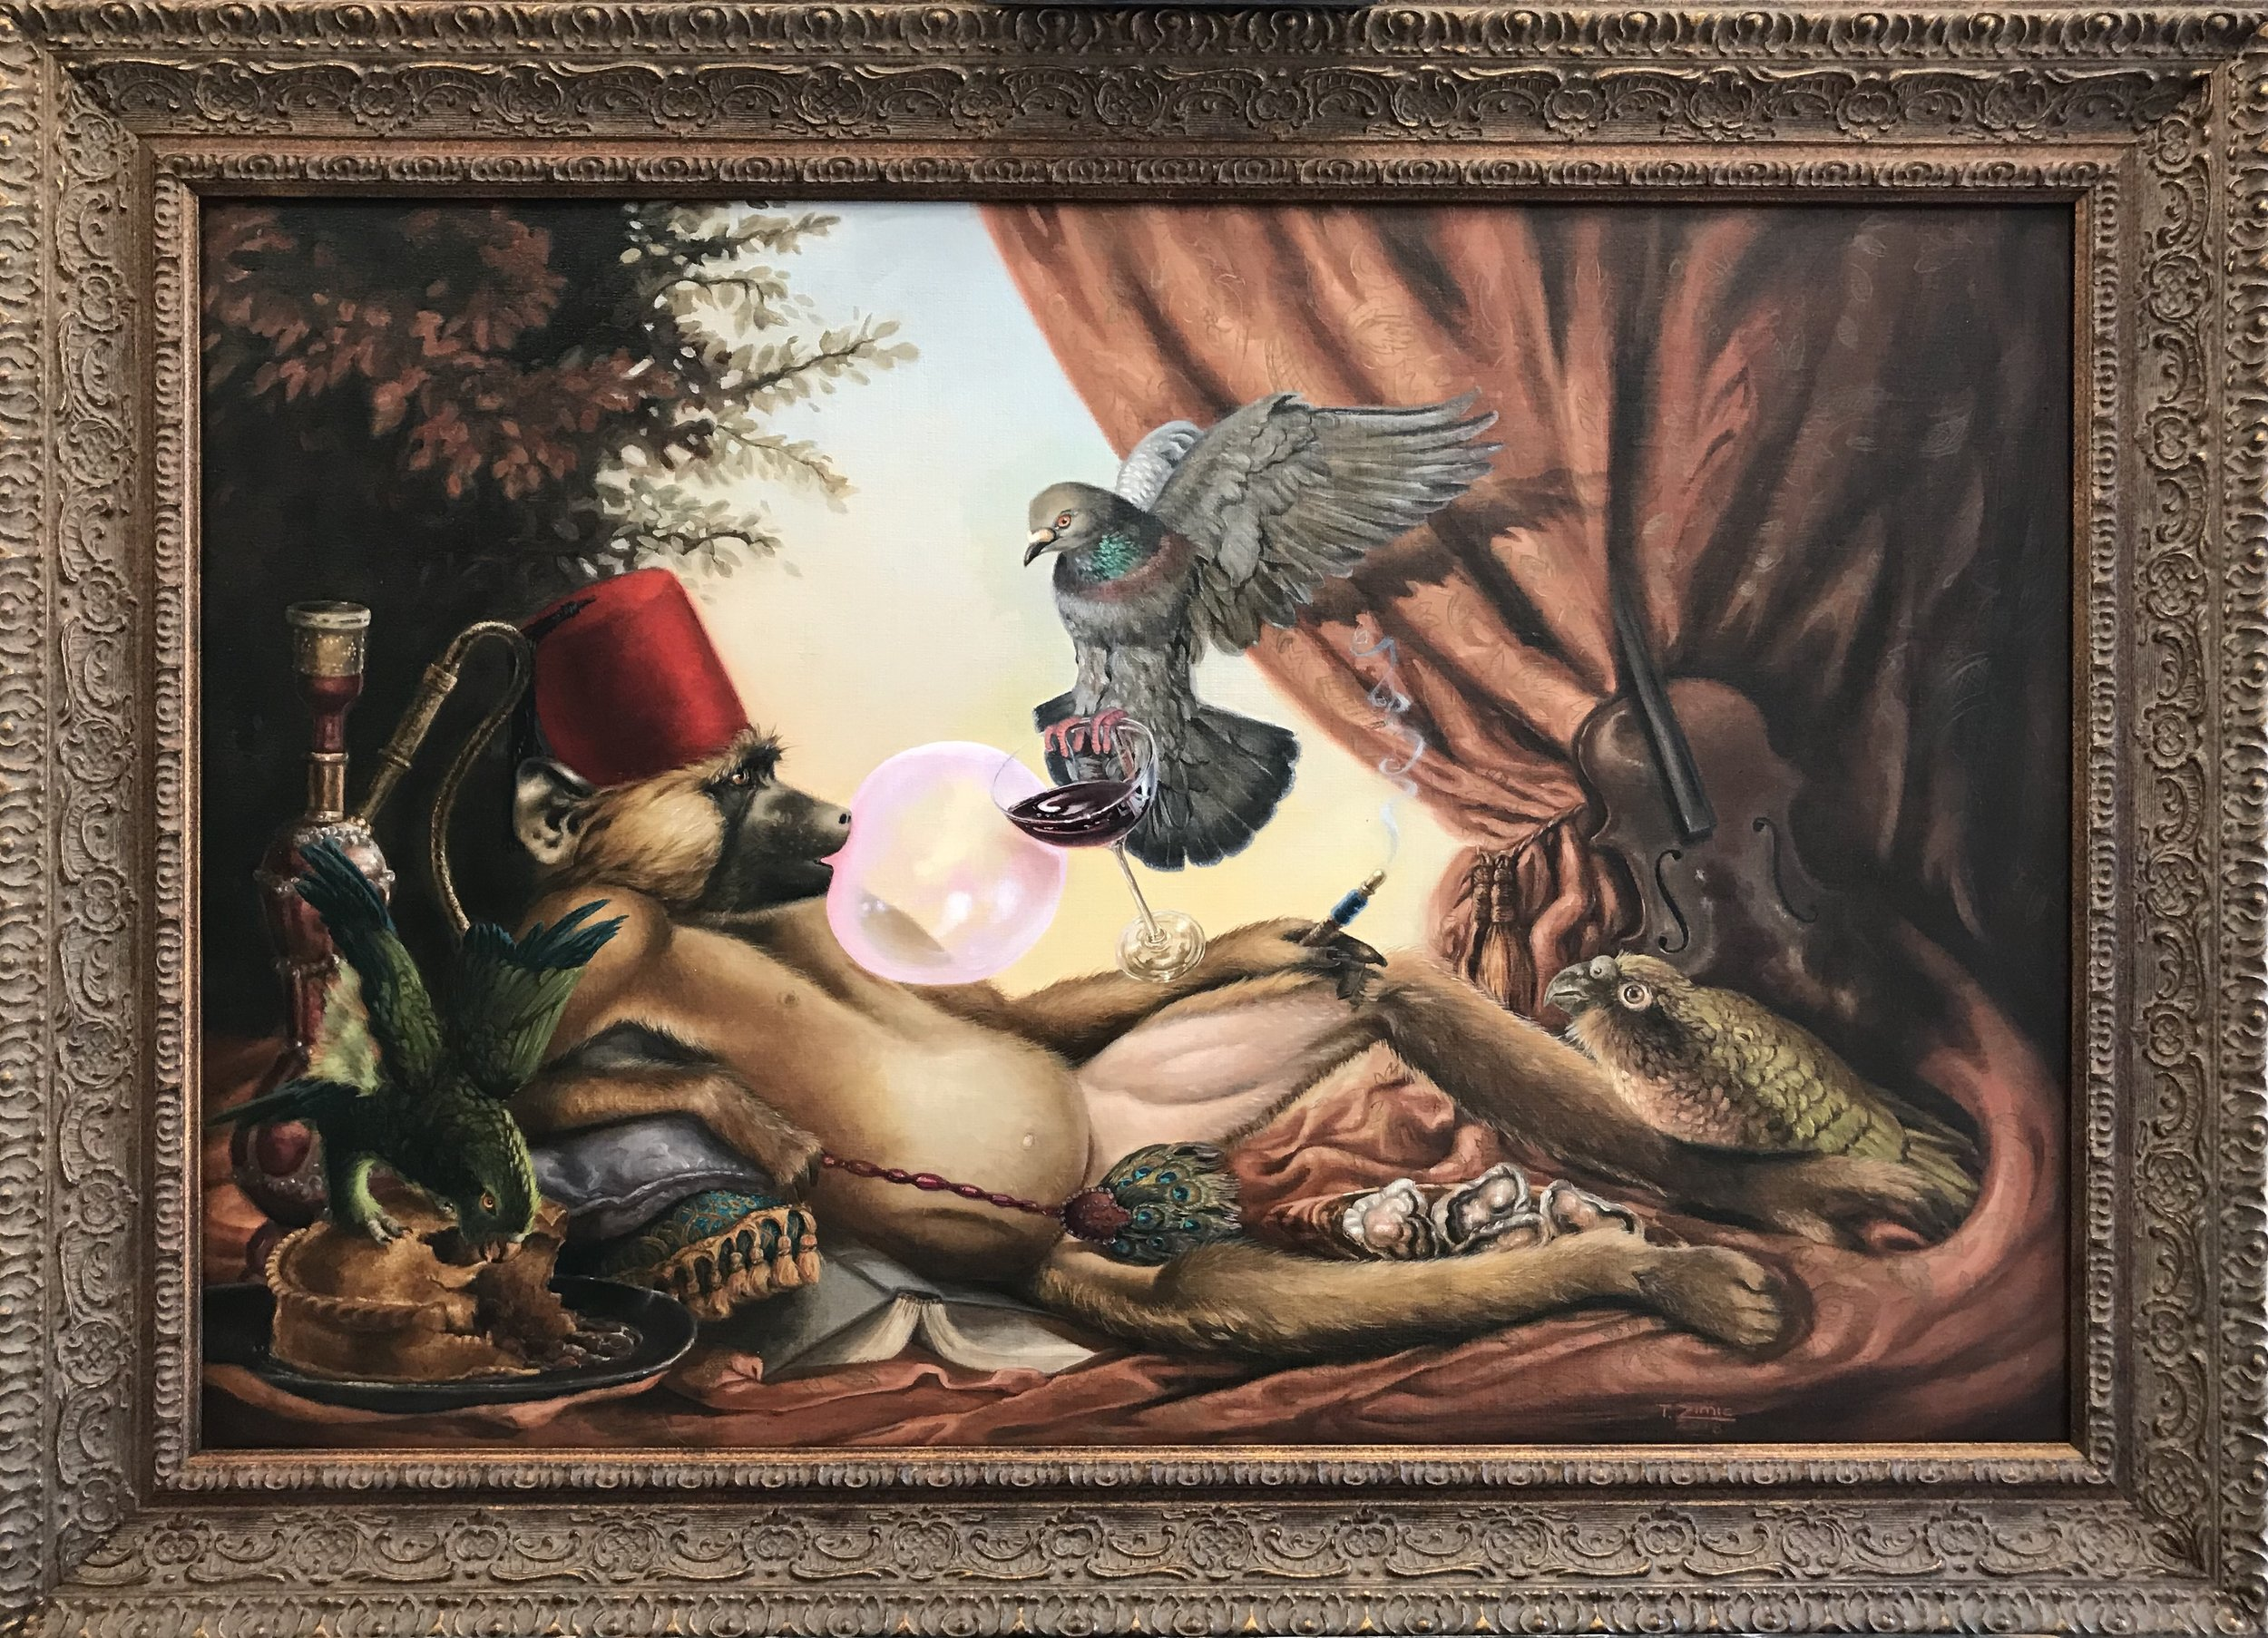 Tricia Zimic Title: Sloth Size: 20 x 30 x 1 Price: $5000 Medium:; Oil